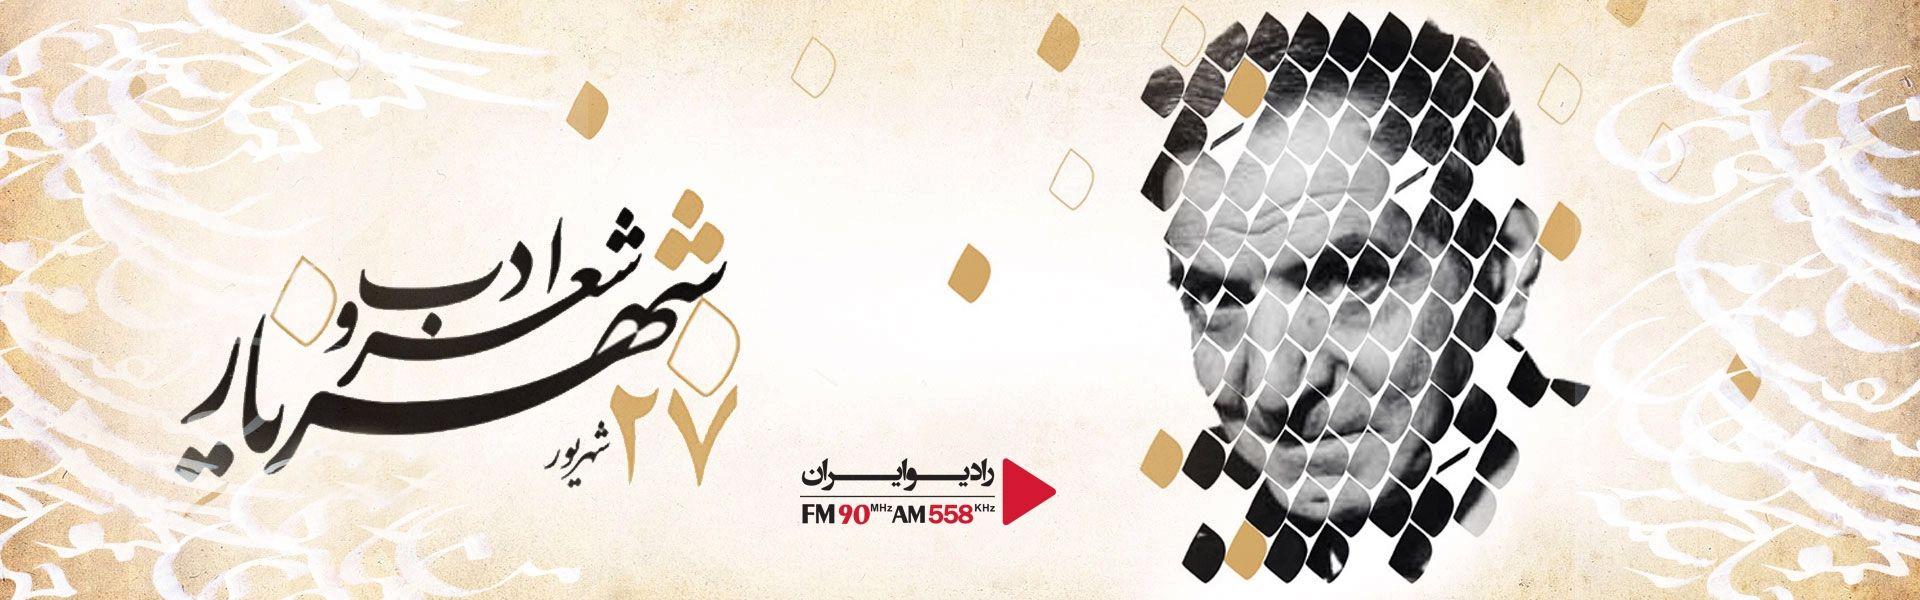 روز شعر و ادب پارسی